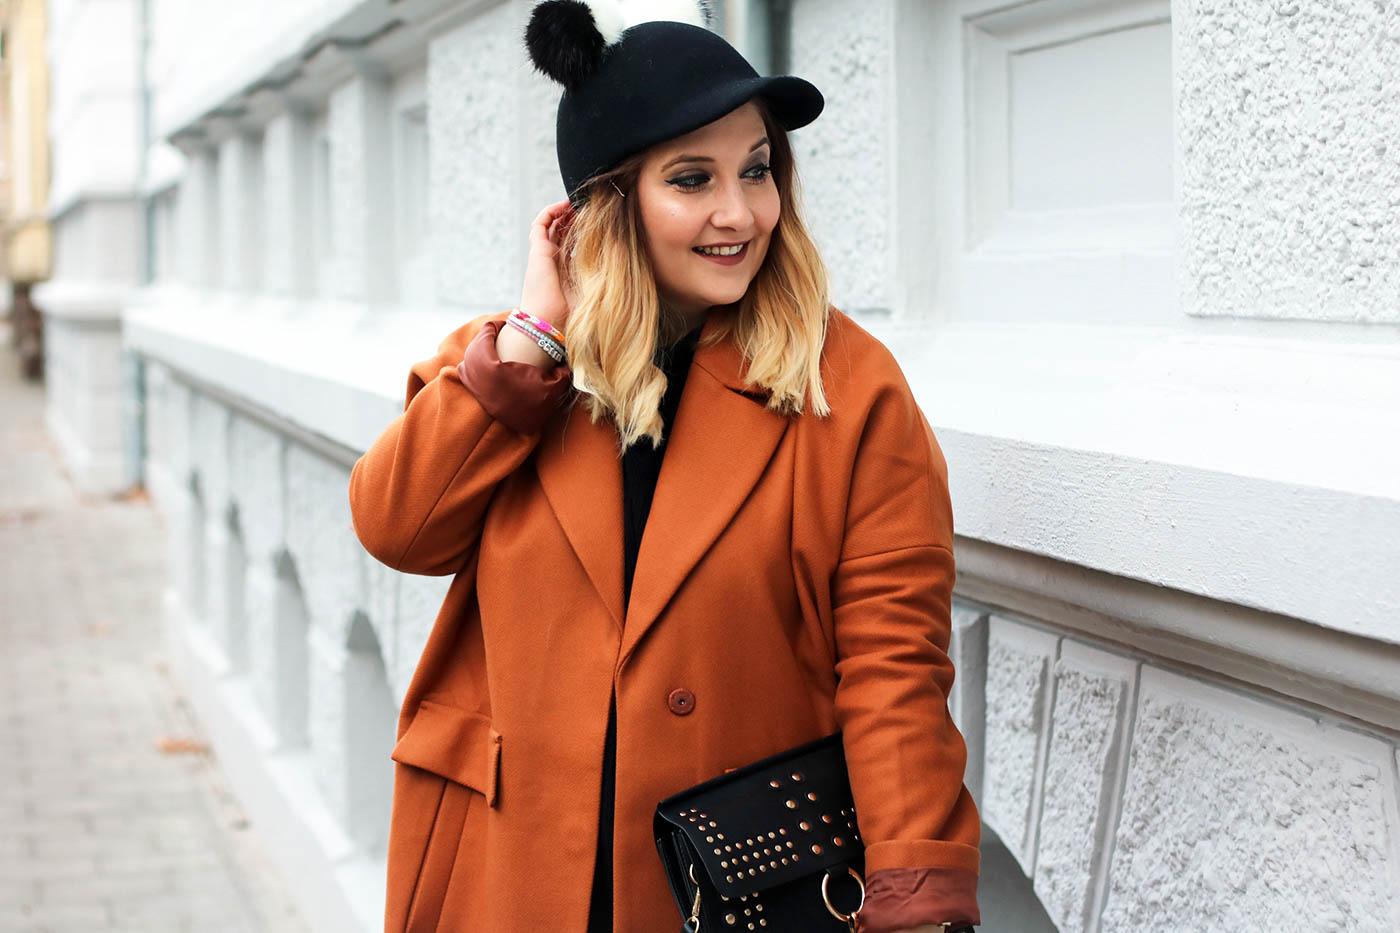 outfit-look-style-mantel-cappe-fashionblog-modeblog-gewinnspiel13